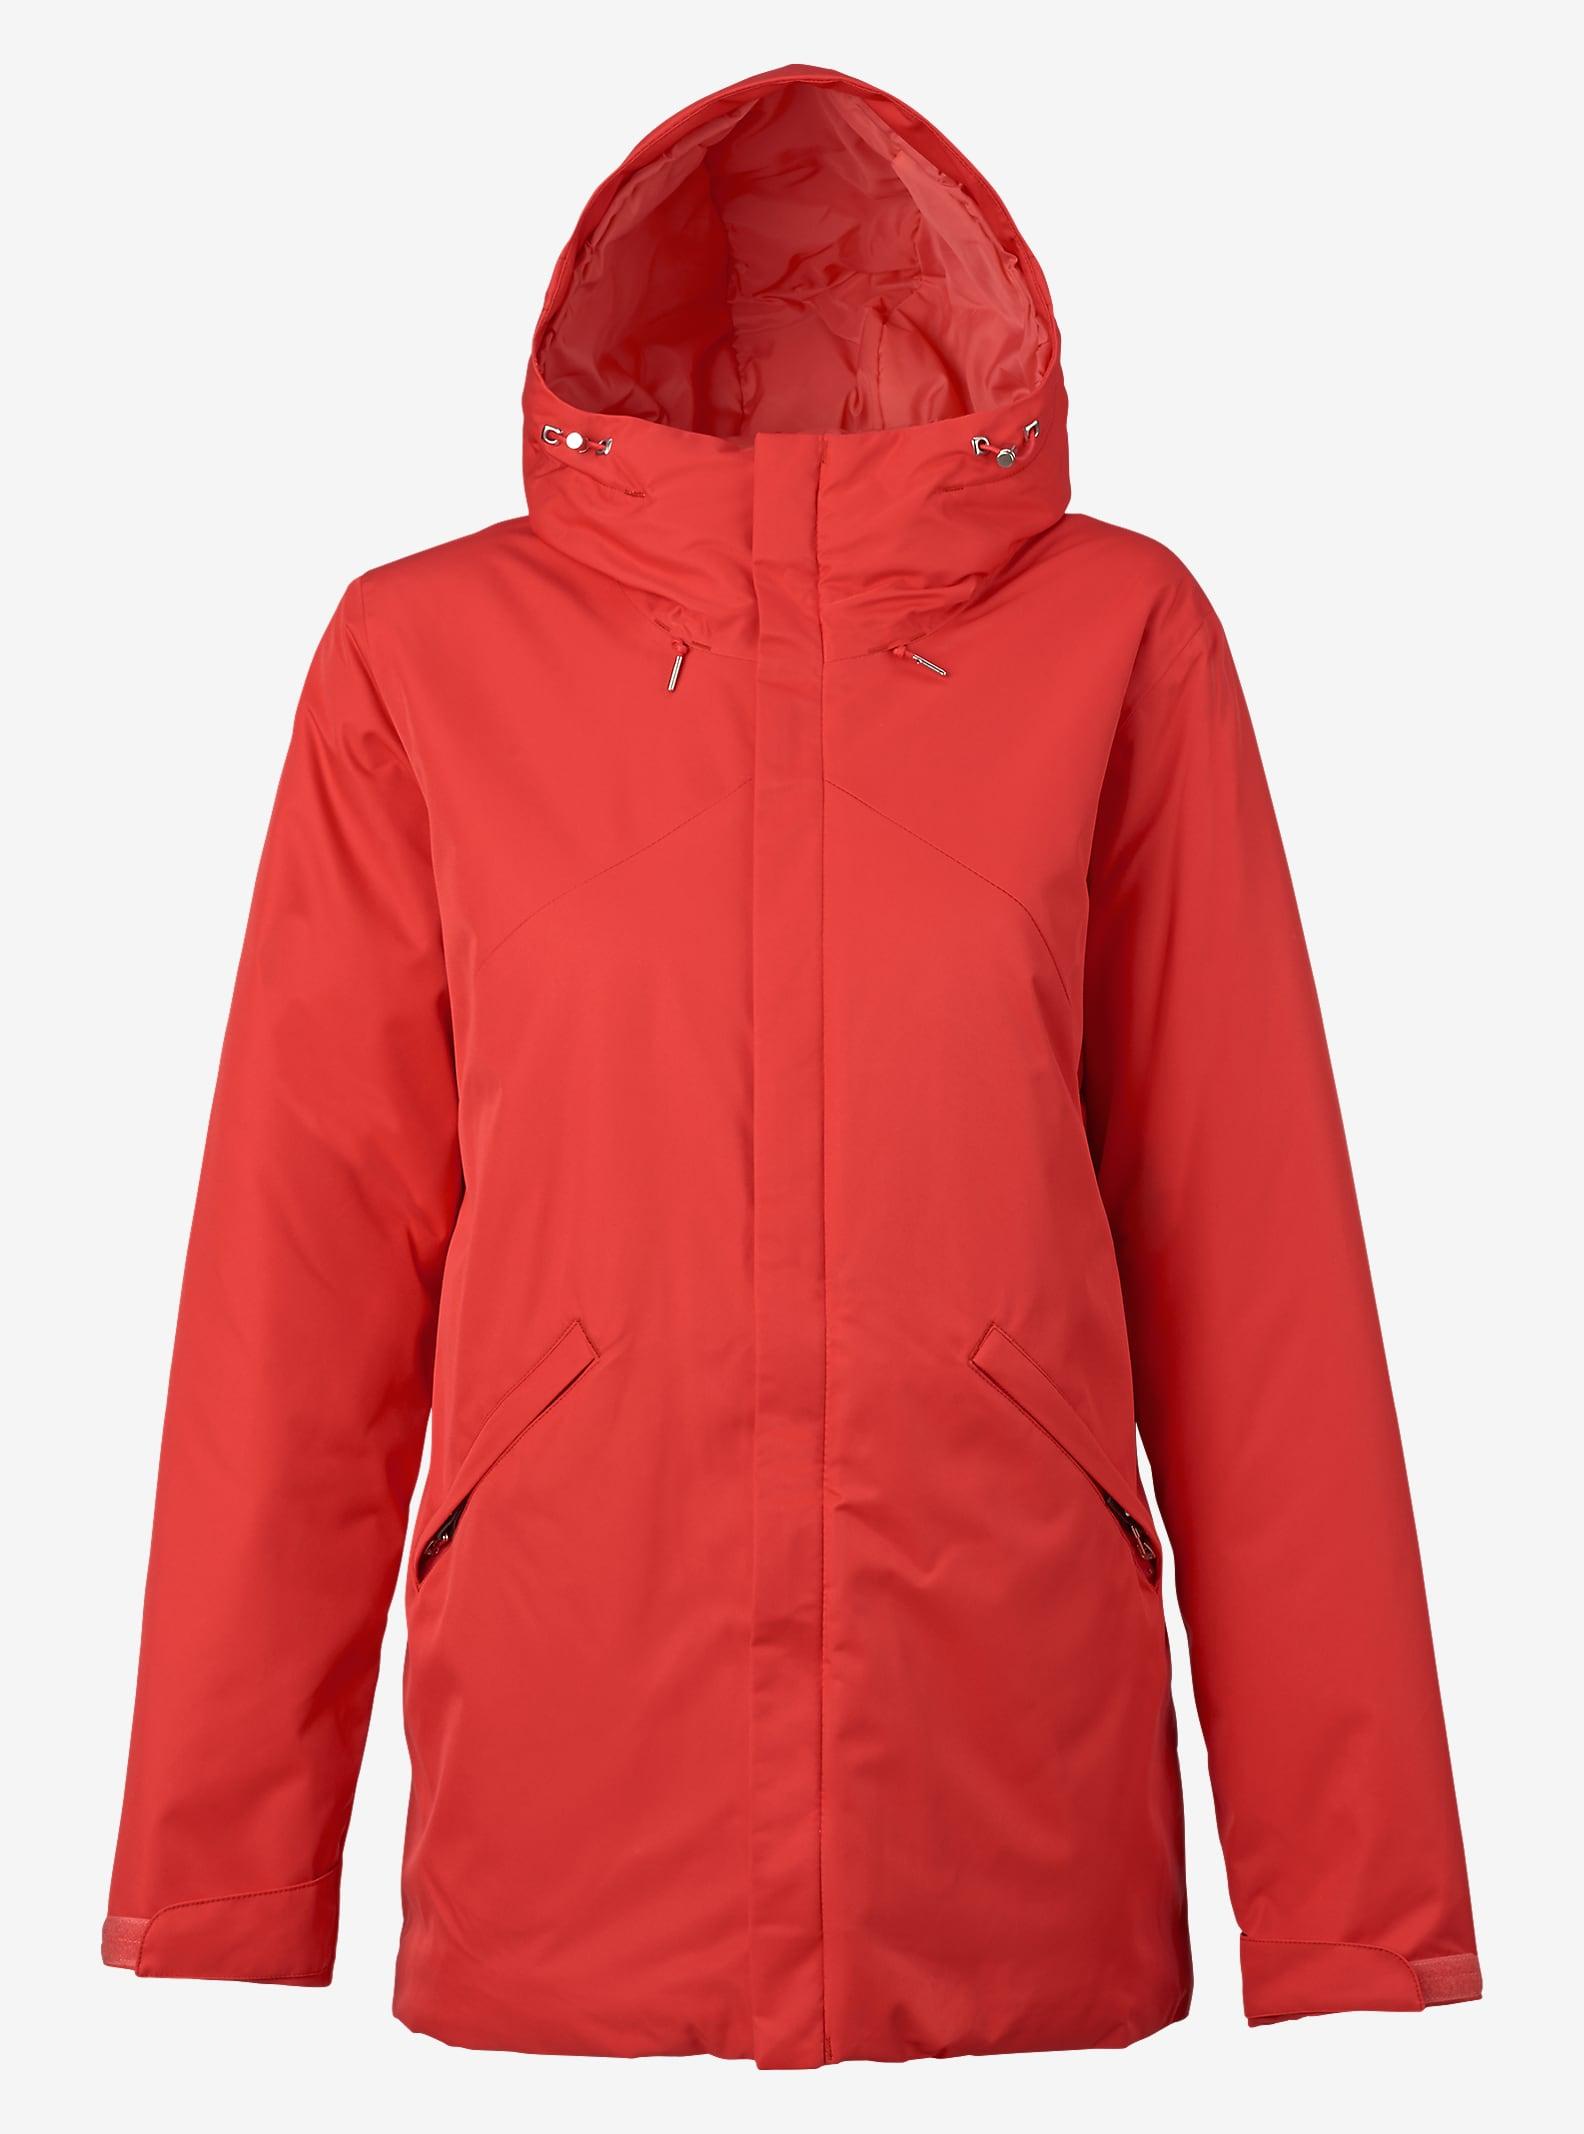 Burton Cadence Jacket shown in Coral